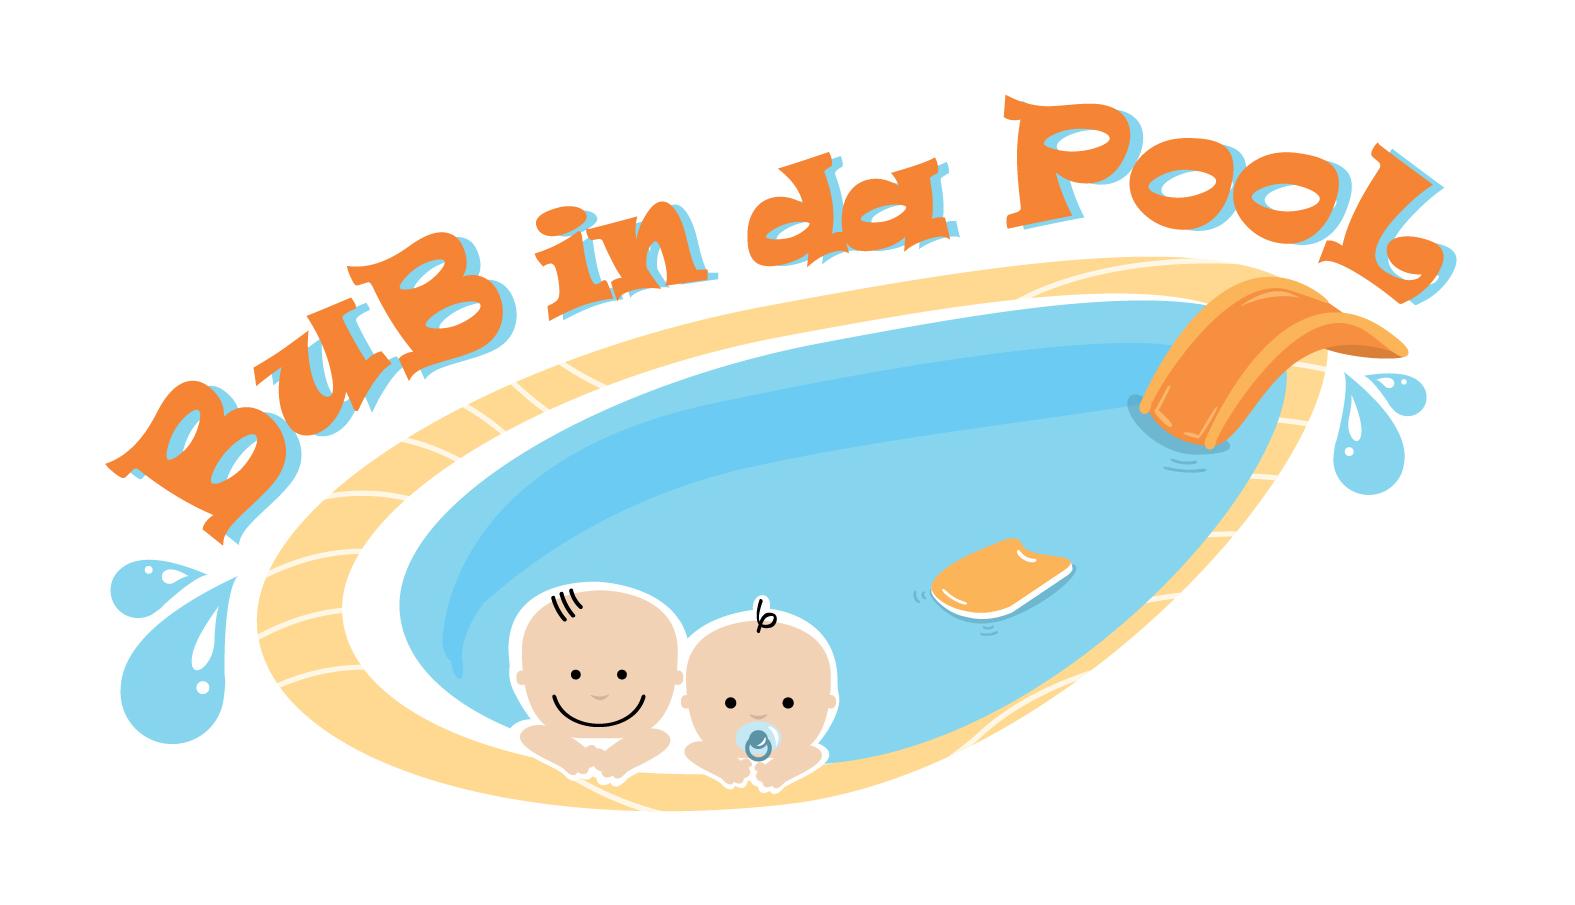 BuB in da PooL สอนว่ายน้ำเด็ก ว่ายน้ำเด็ก ว่ายน้ำทารก สอนว่ายน้ำทารก โรงเรียนสอนว่ายน้ำเด็ก สระน้ำเกลือ สระน้ำอุ่น